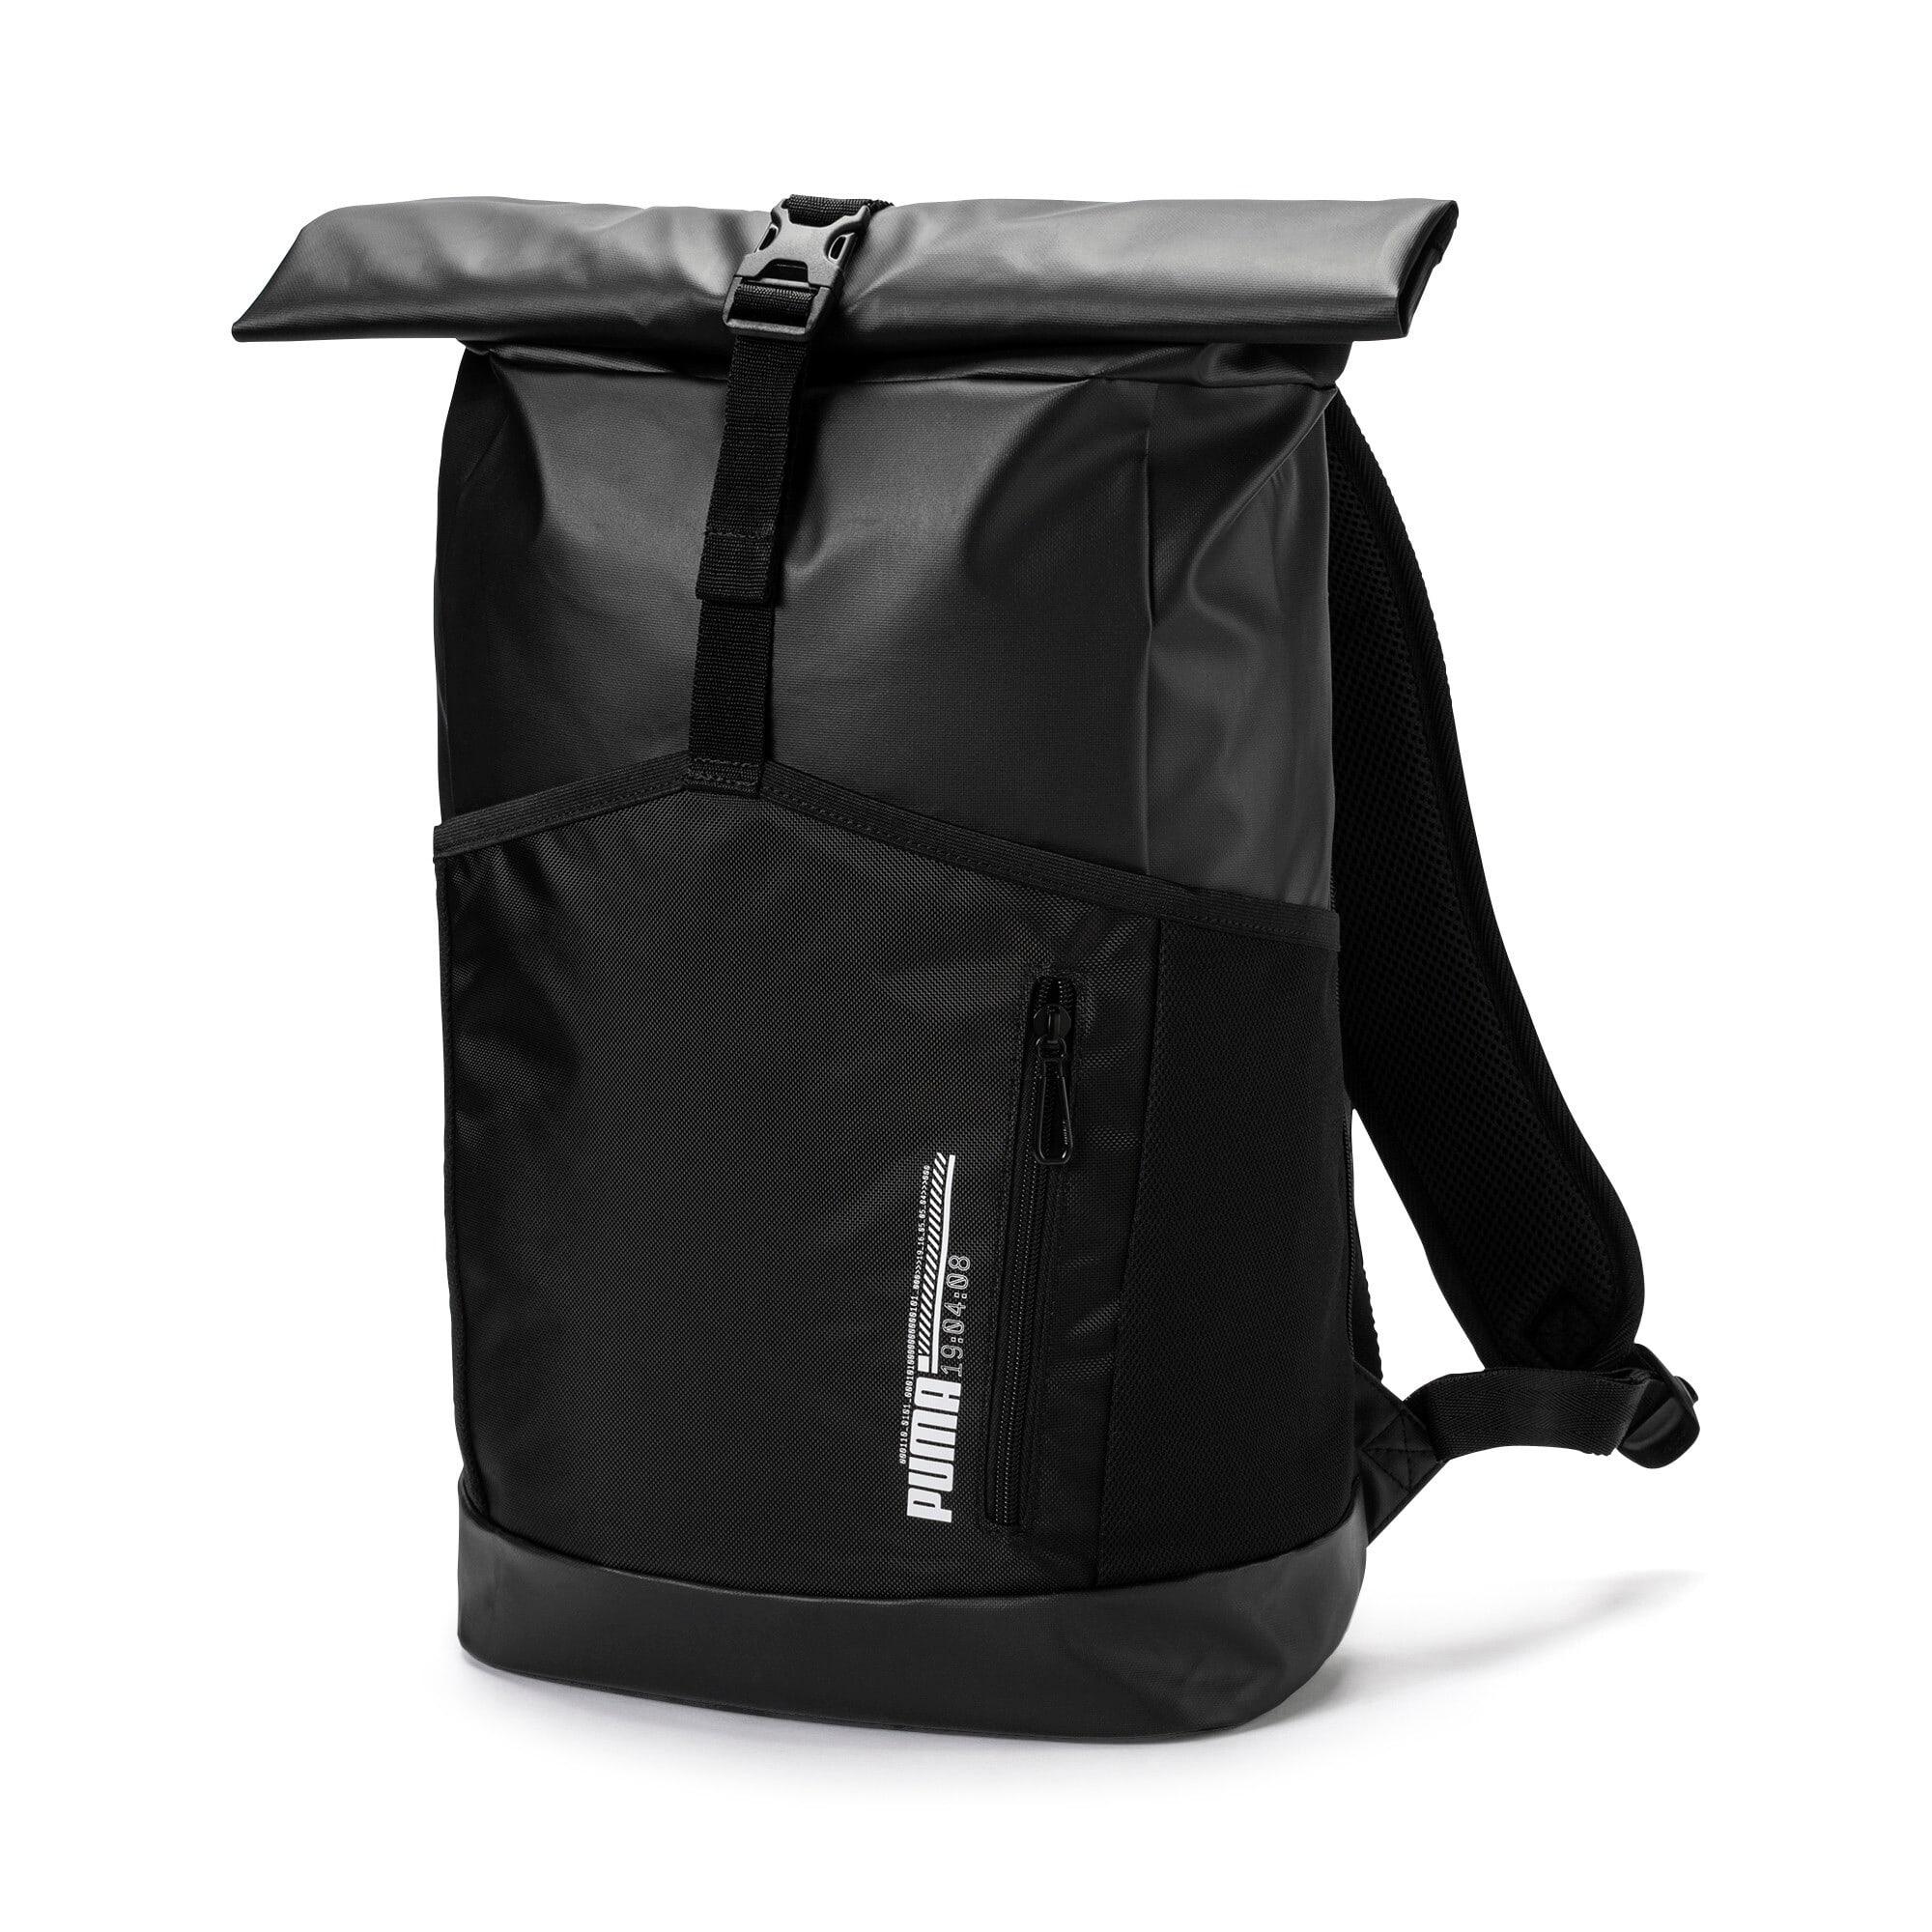 Thumbnail 1 of Energy Rolltop Backpack, Puma Black, medium-IND